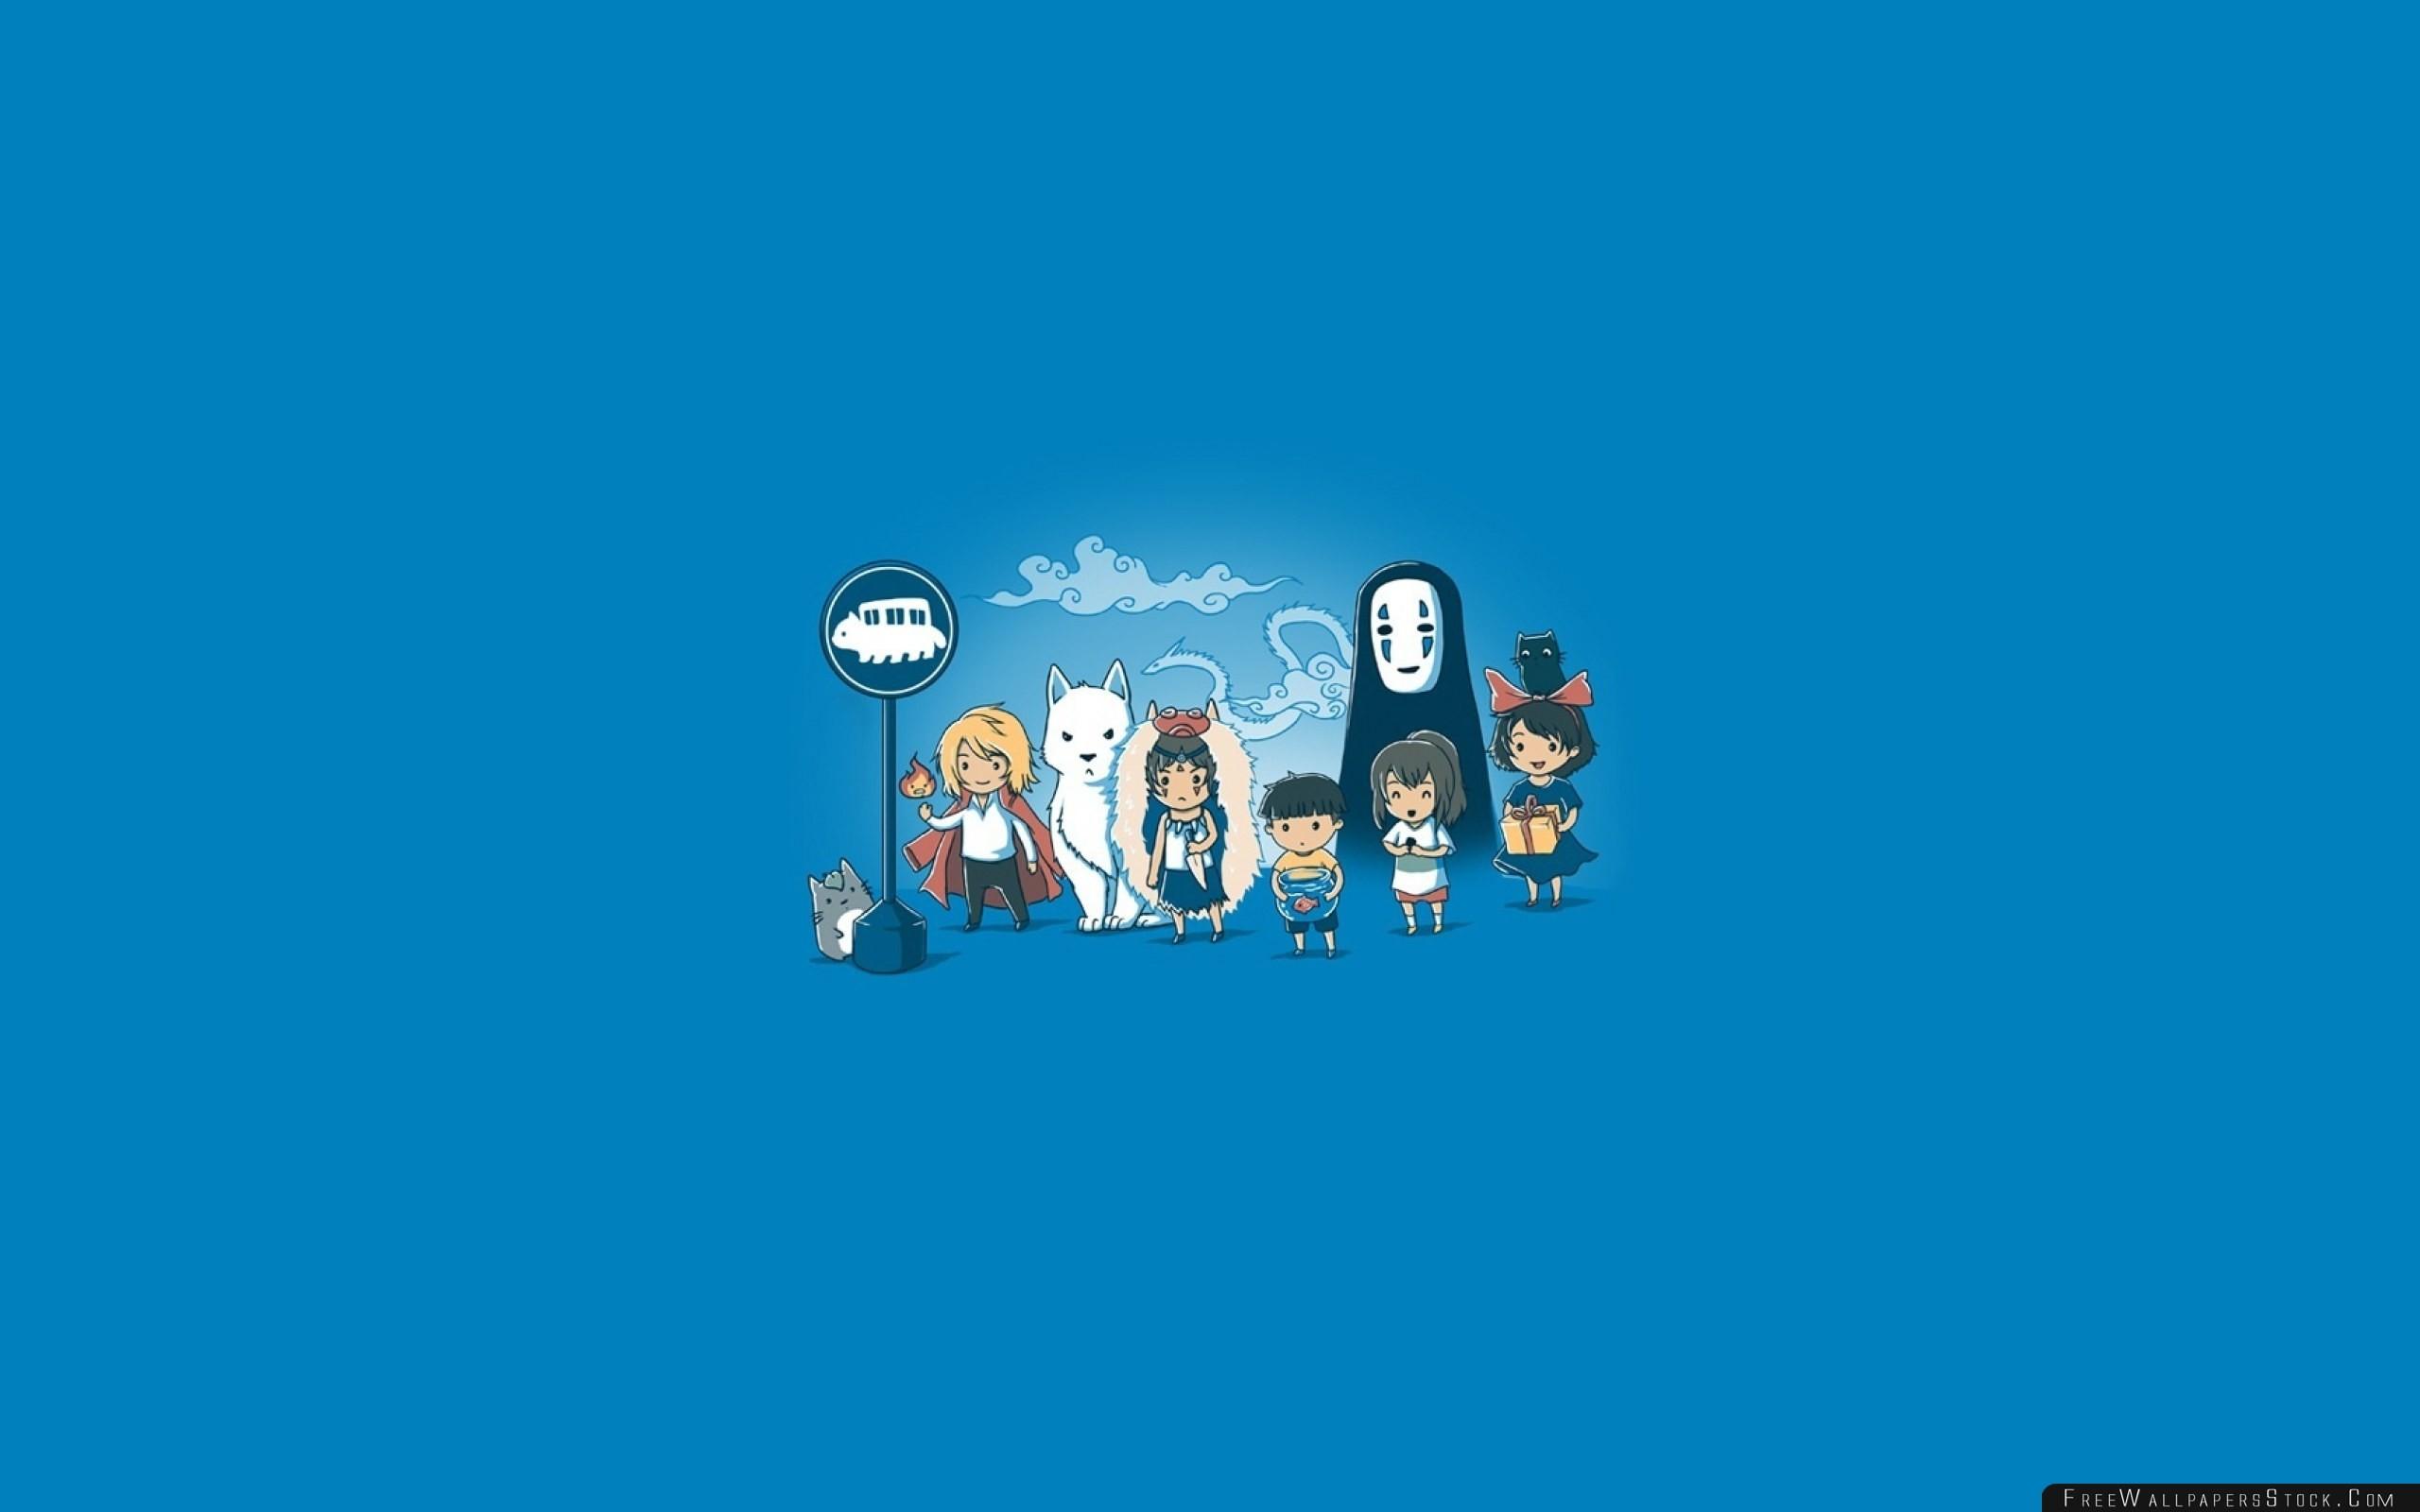 Download Free Wallpaper Howls Moving Castle Art Hayao Miyazaki Anime